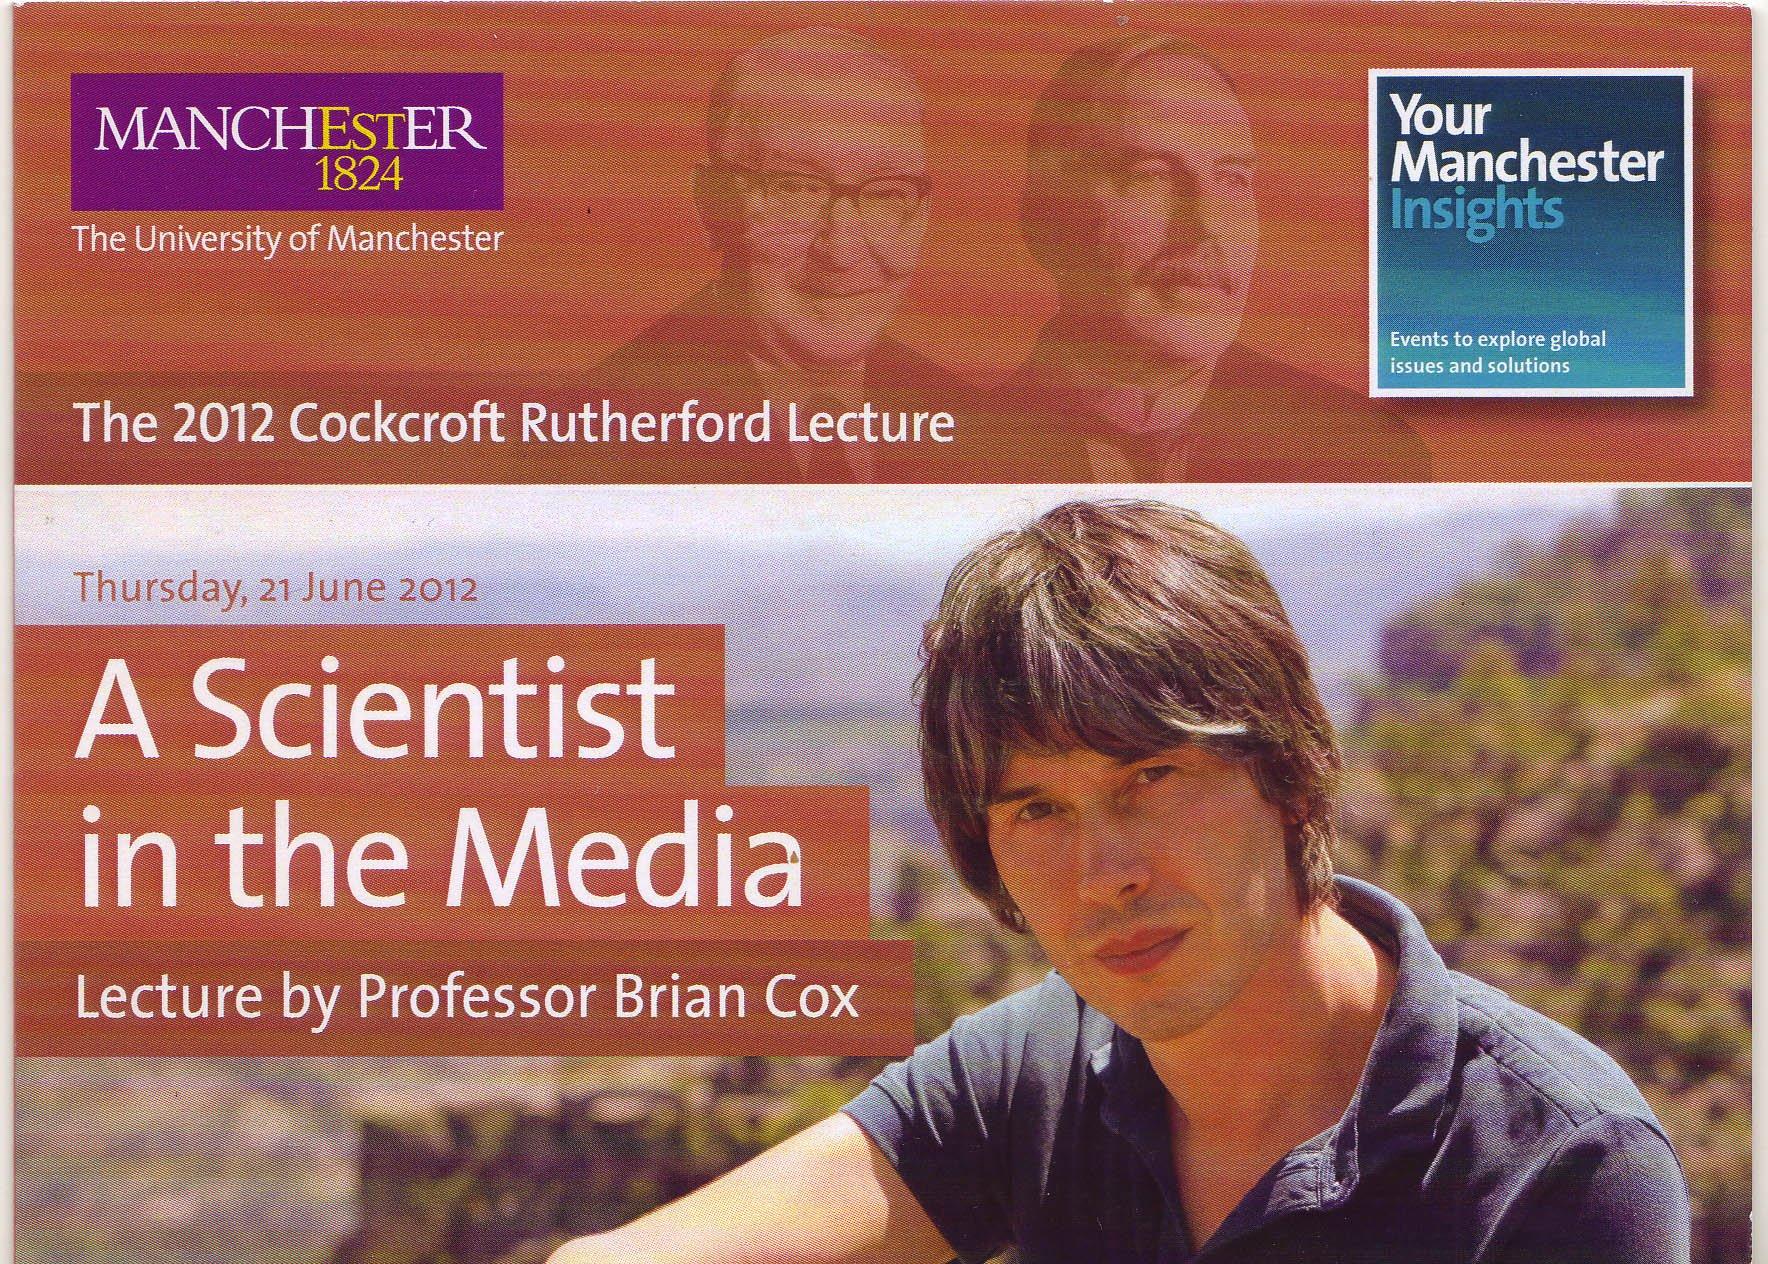 Brian_Cox - A Scientist_in_the_Media